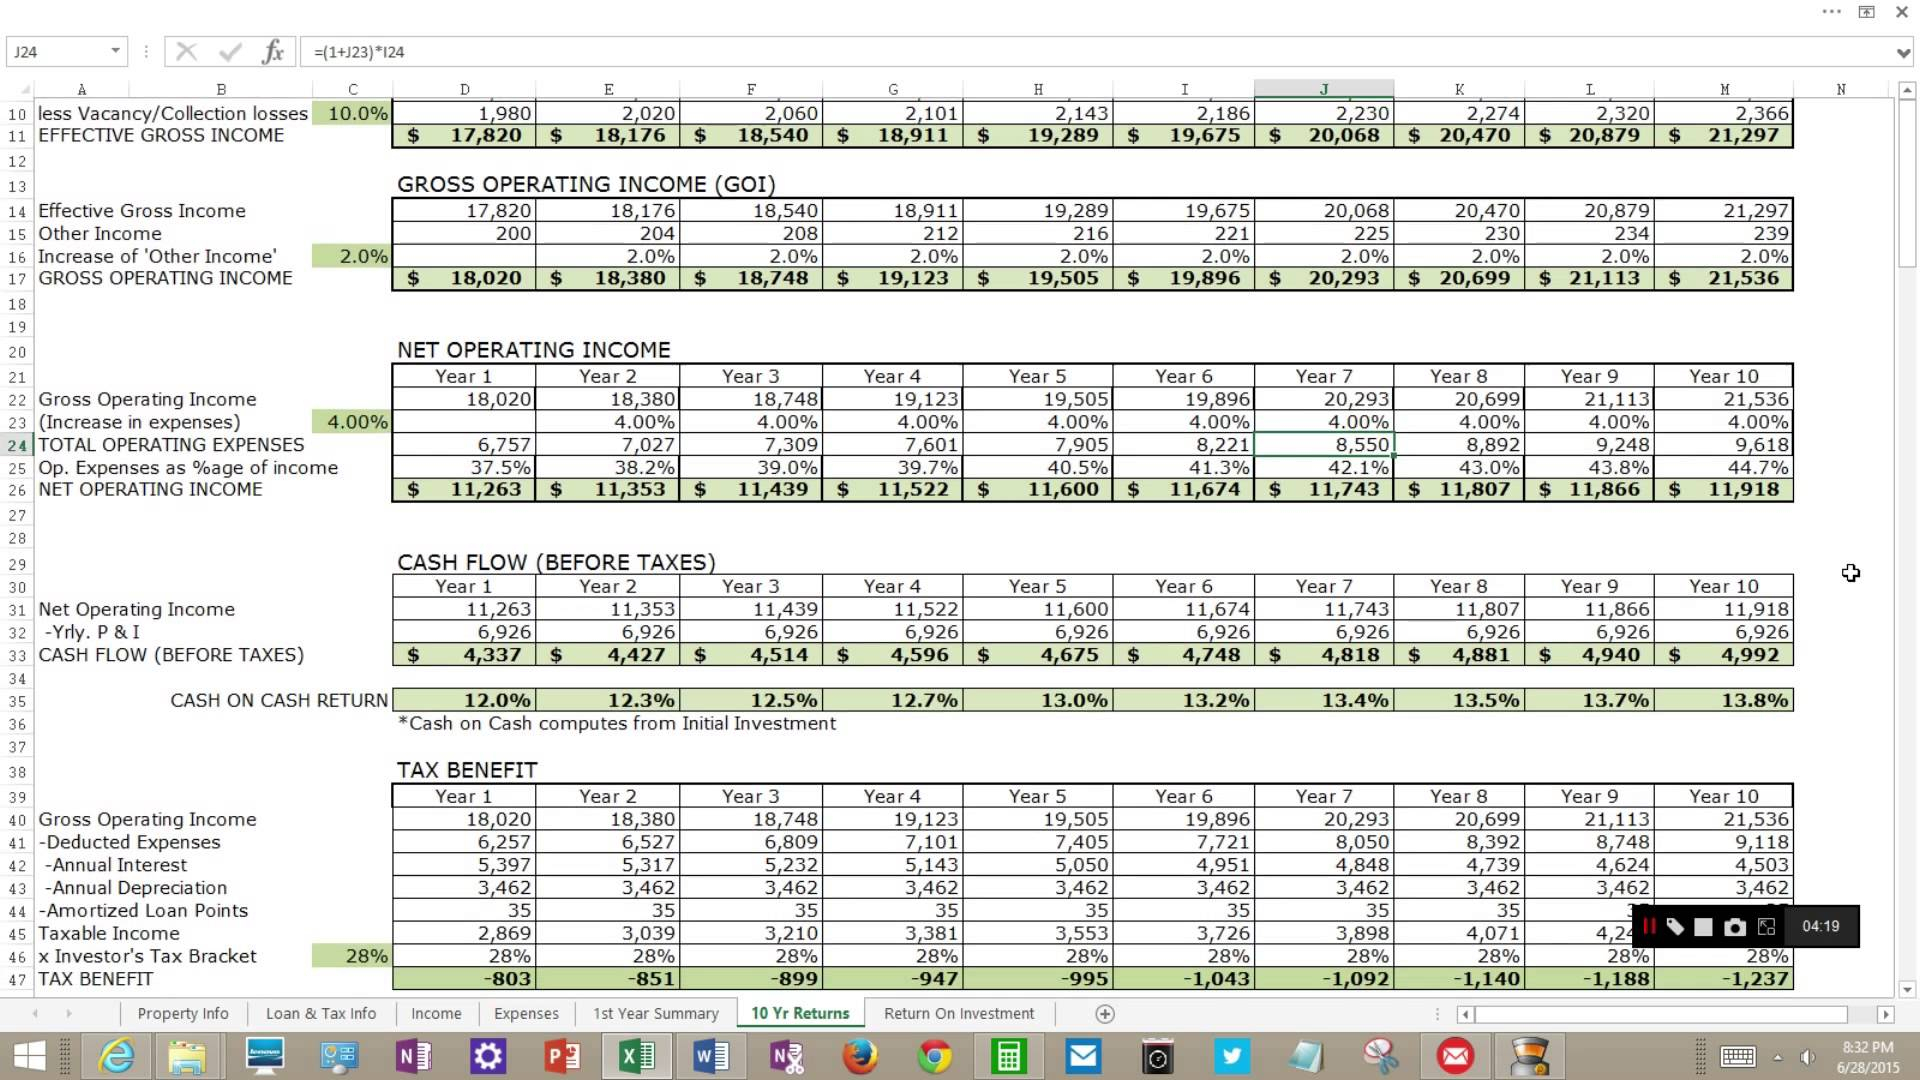 excel spreadsheet for rental property management spreadsheet downloa excel spreadsheet for